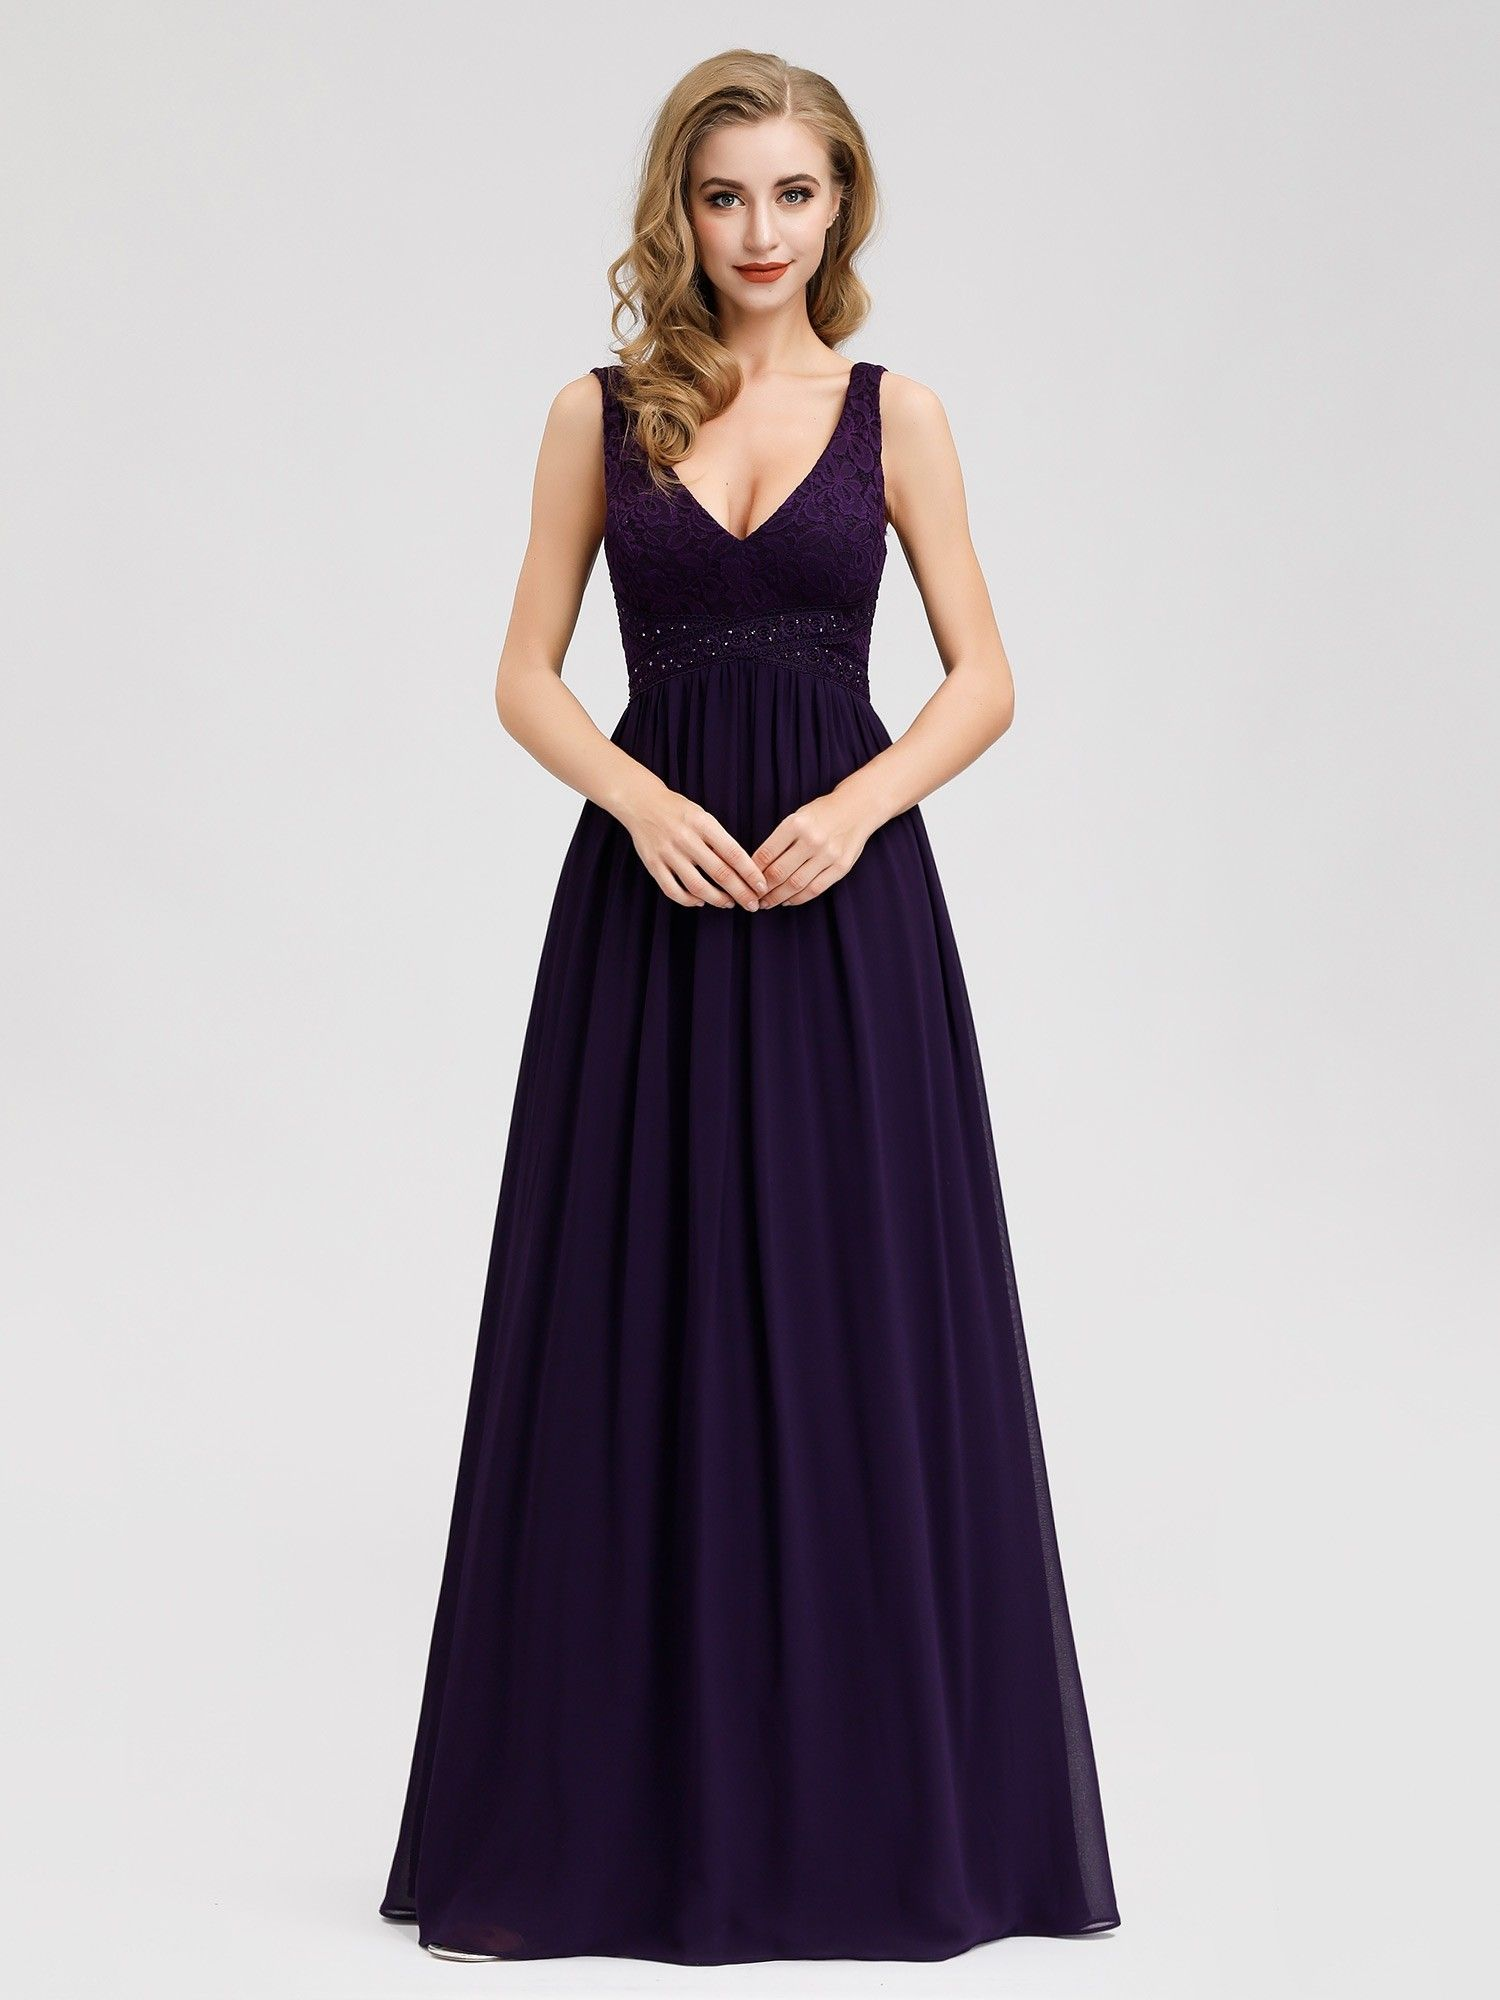 Sleeveless V Neck Long Purple Evening Dress [ 2000 x 1500 Pixel ]